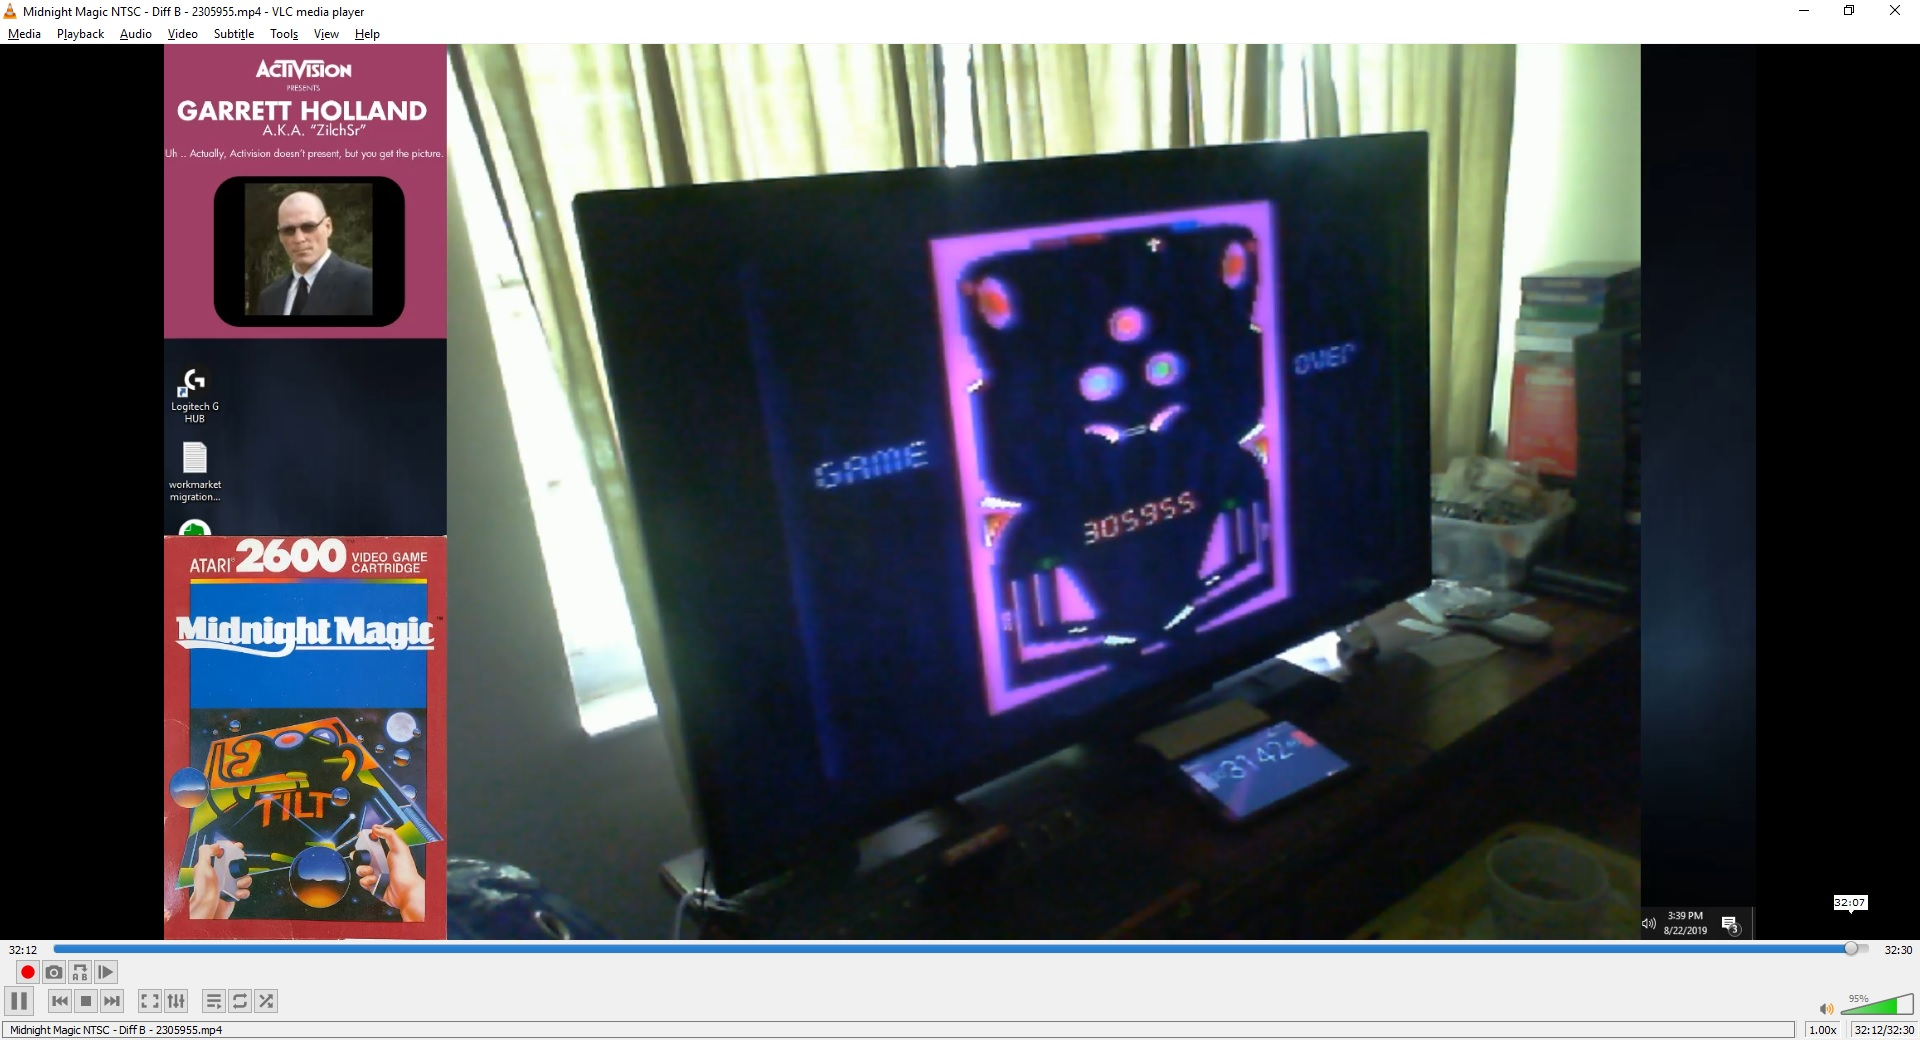 ZilchSr: Midnight Magic (Atari 2600 Novice/B) 2,305,955 points on 2019-09-30 21:37:12